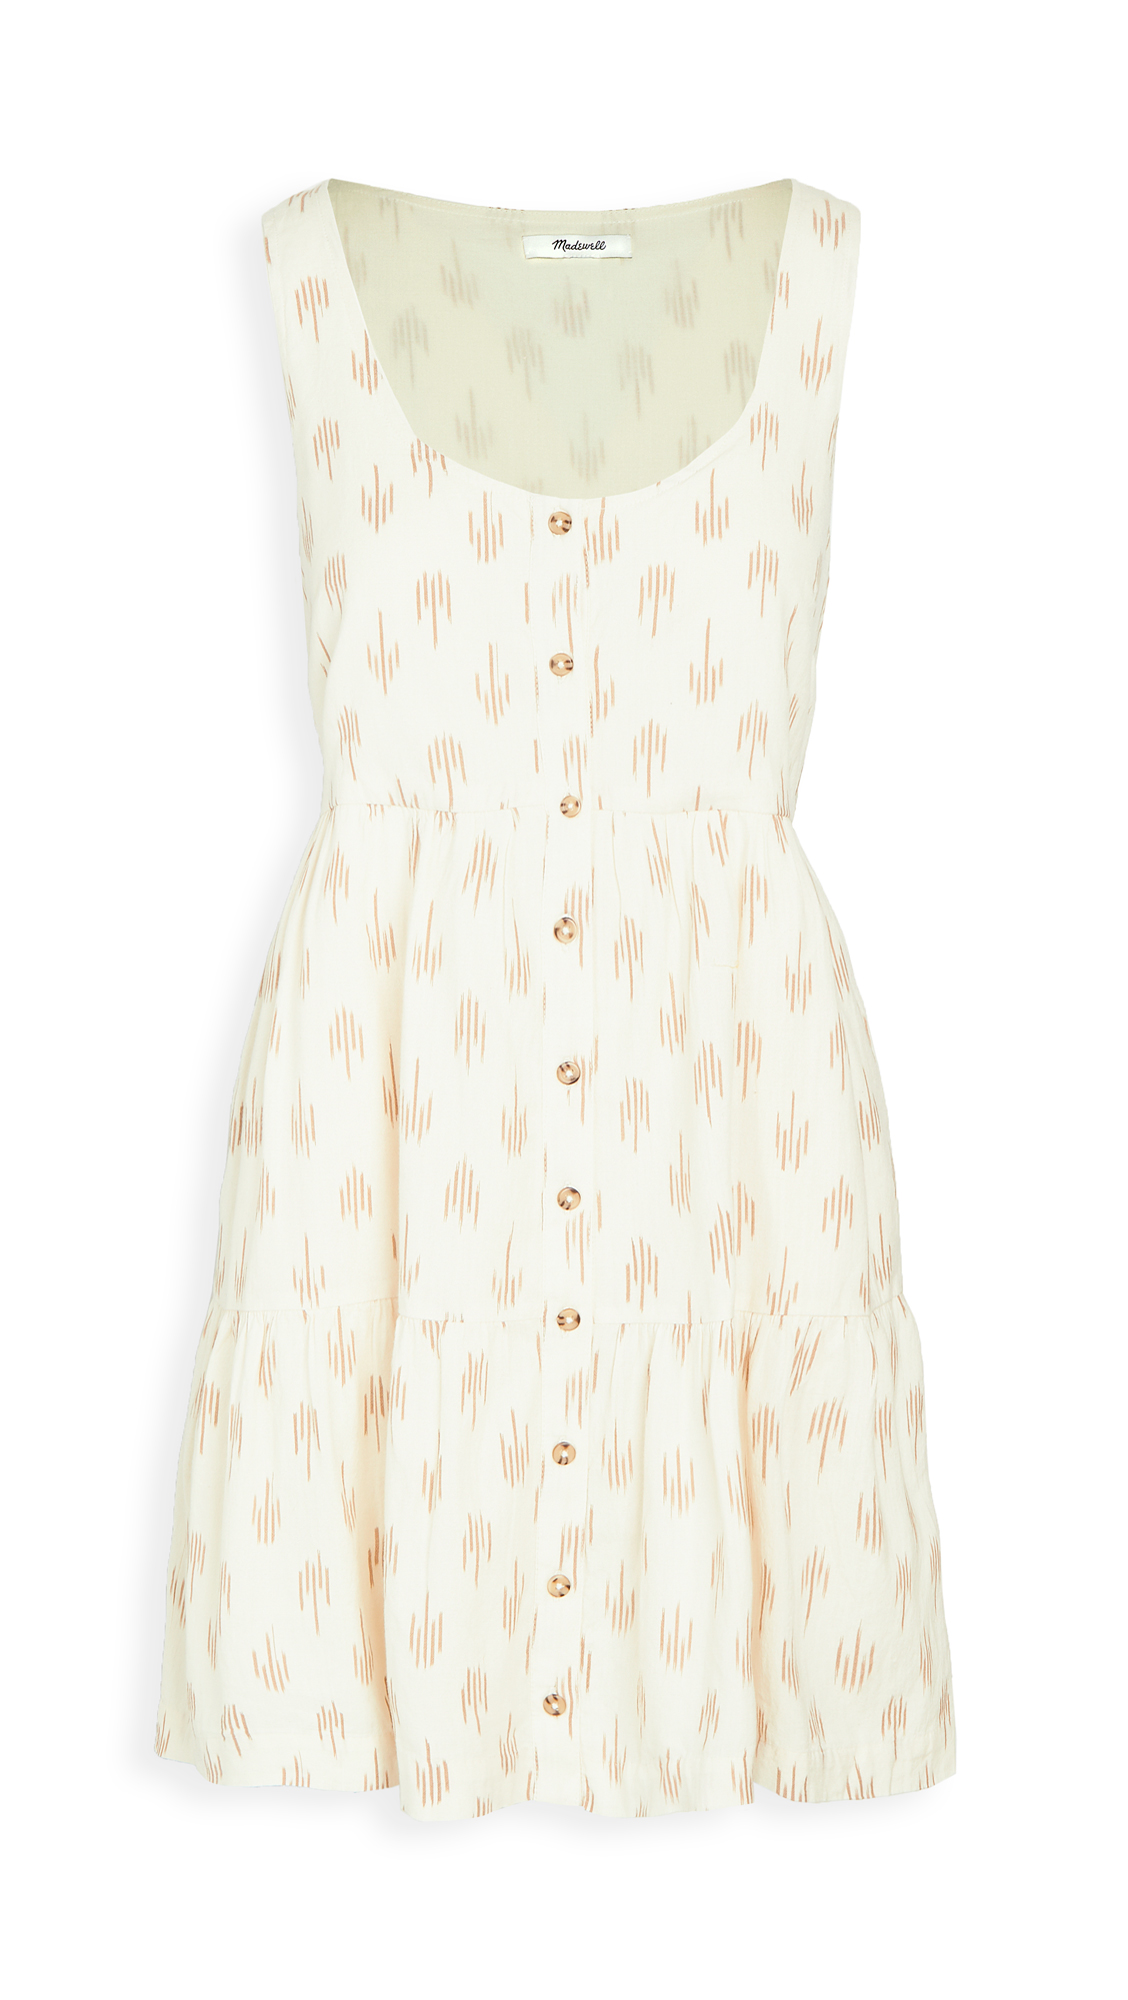 Madewell Tank Button Front Mini Dress